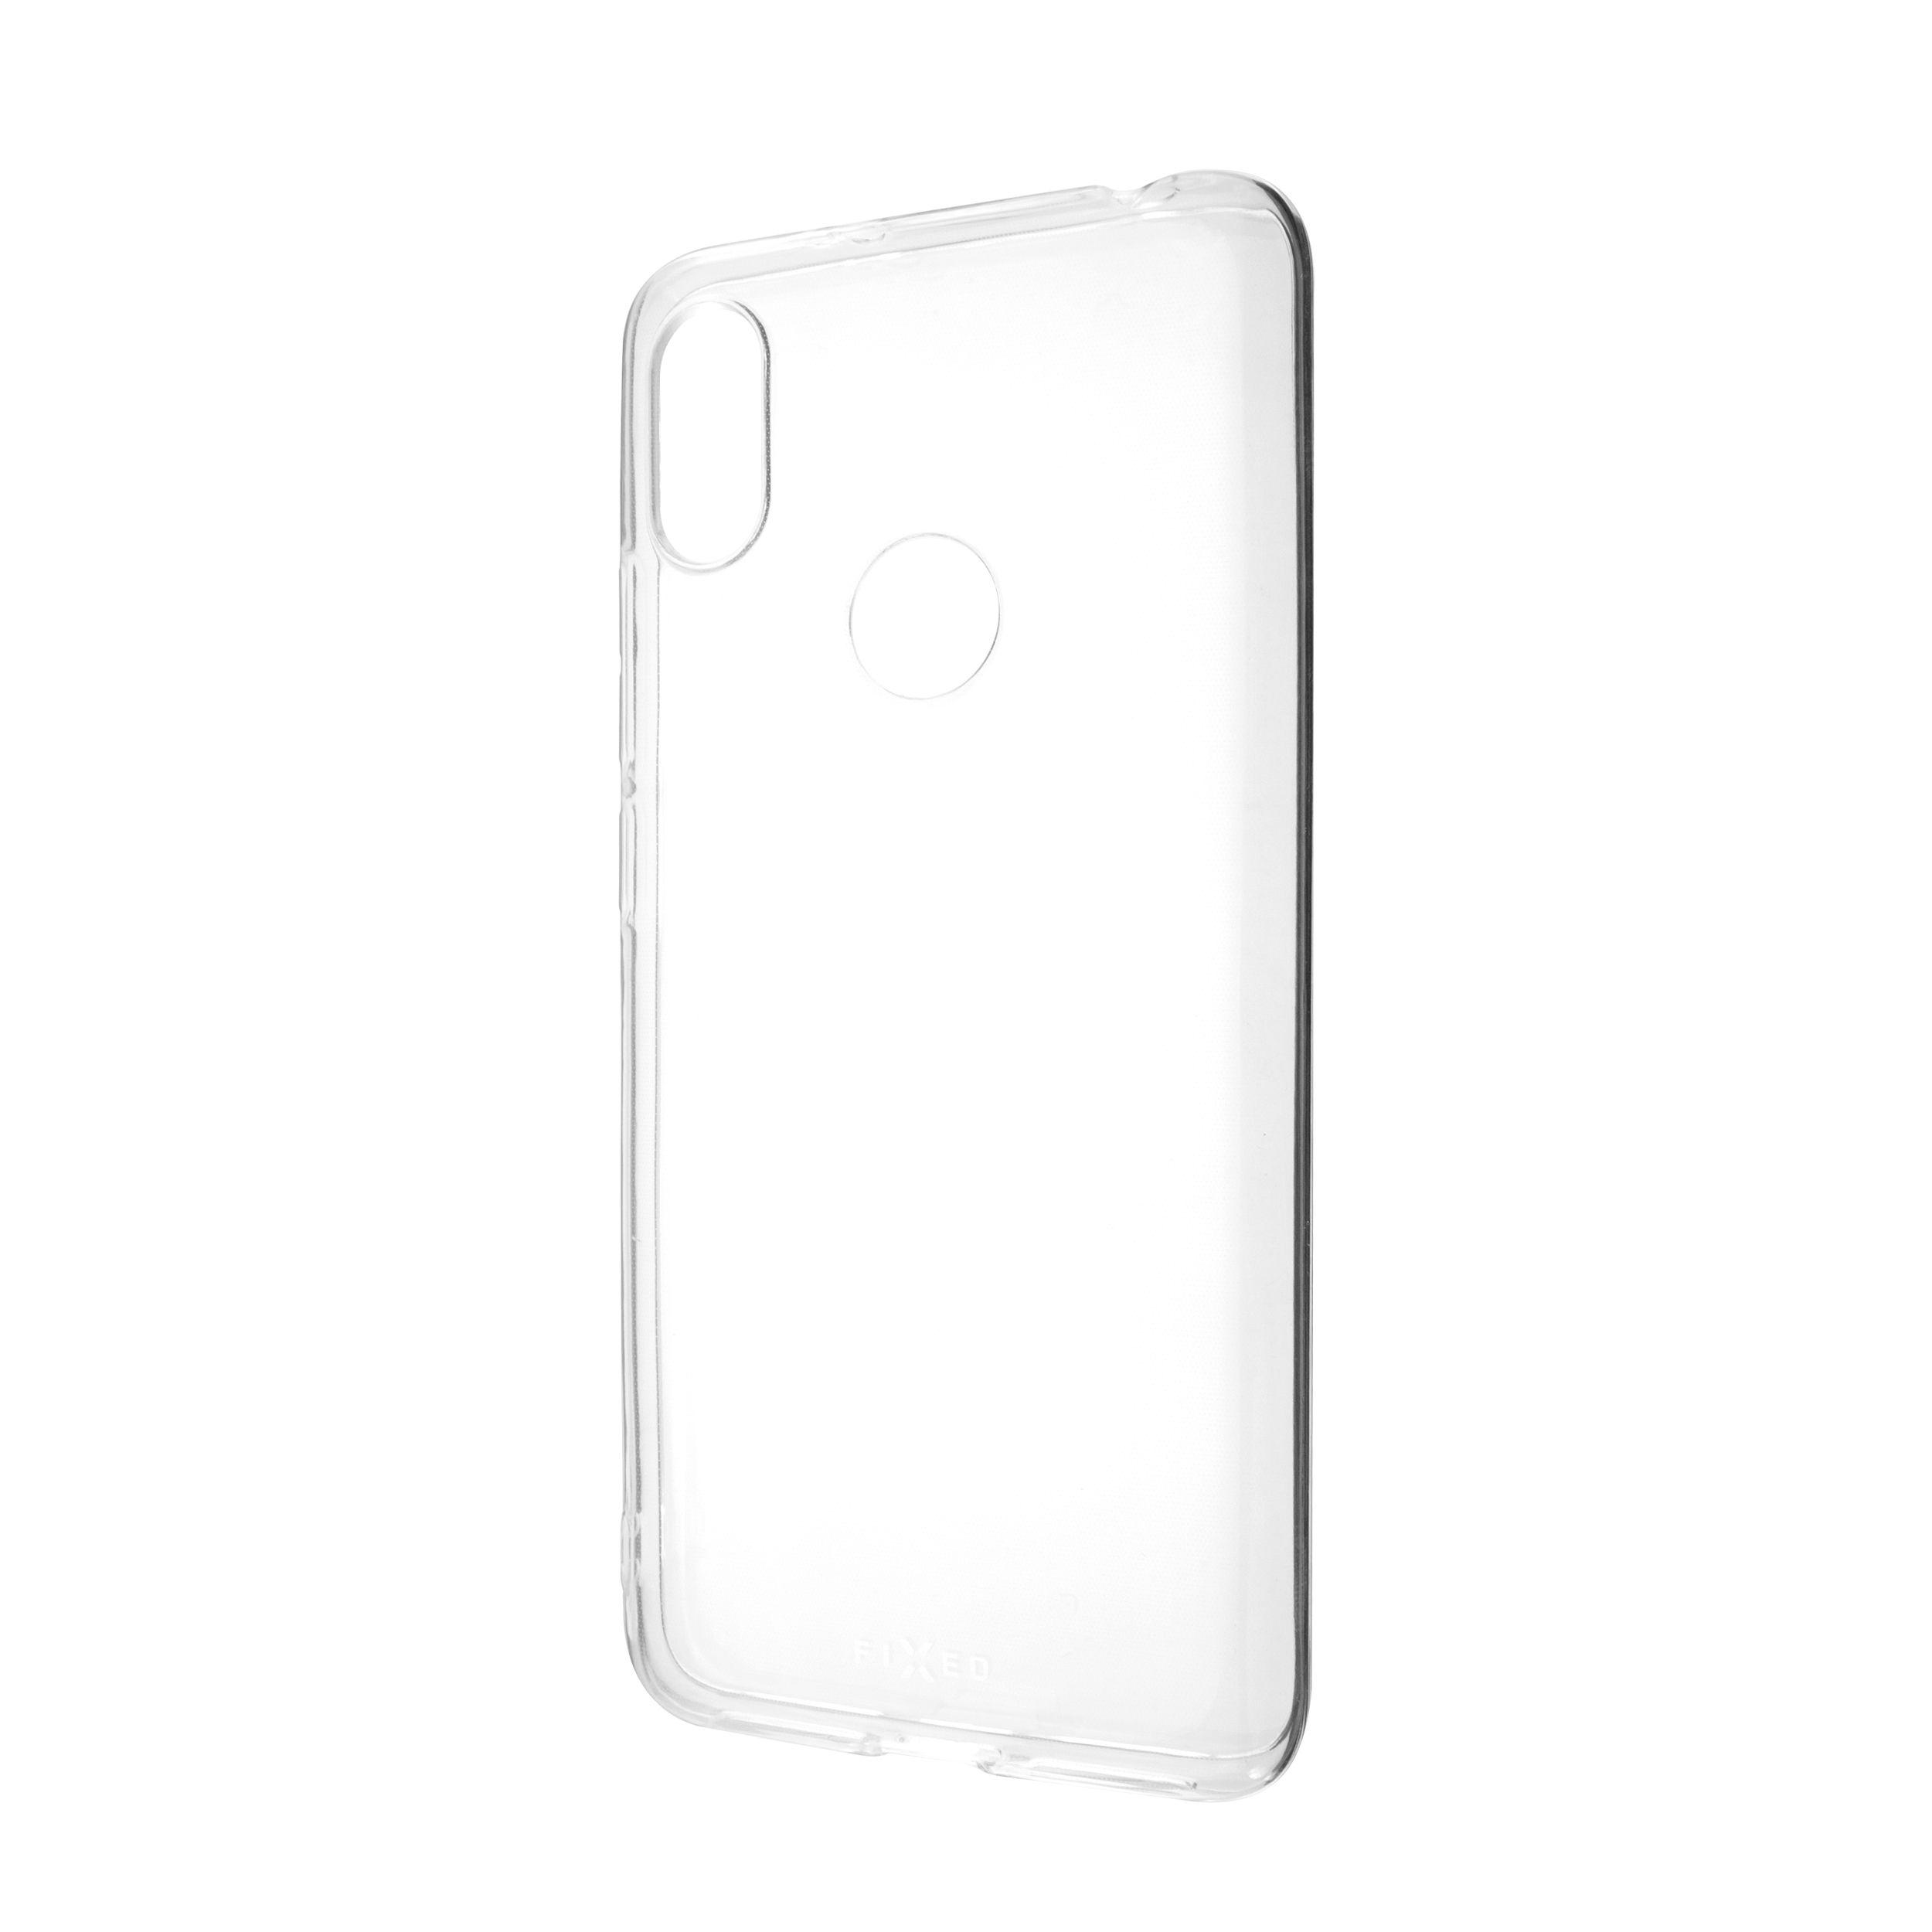 Ultratenké TPU gelové pouzdro FIXED Skin pro Xiaomi Redmi S2, 0,6 mm, čiré